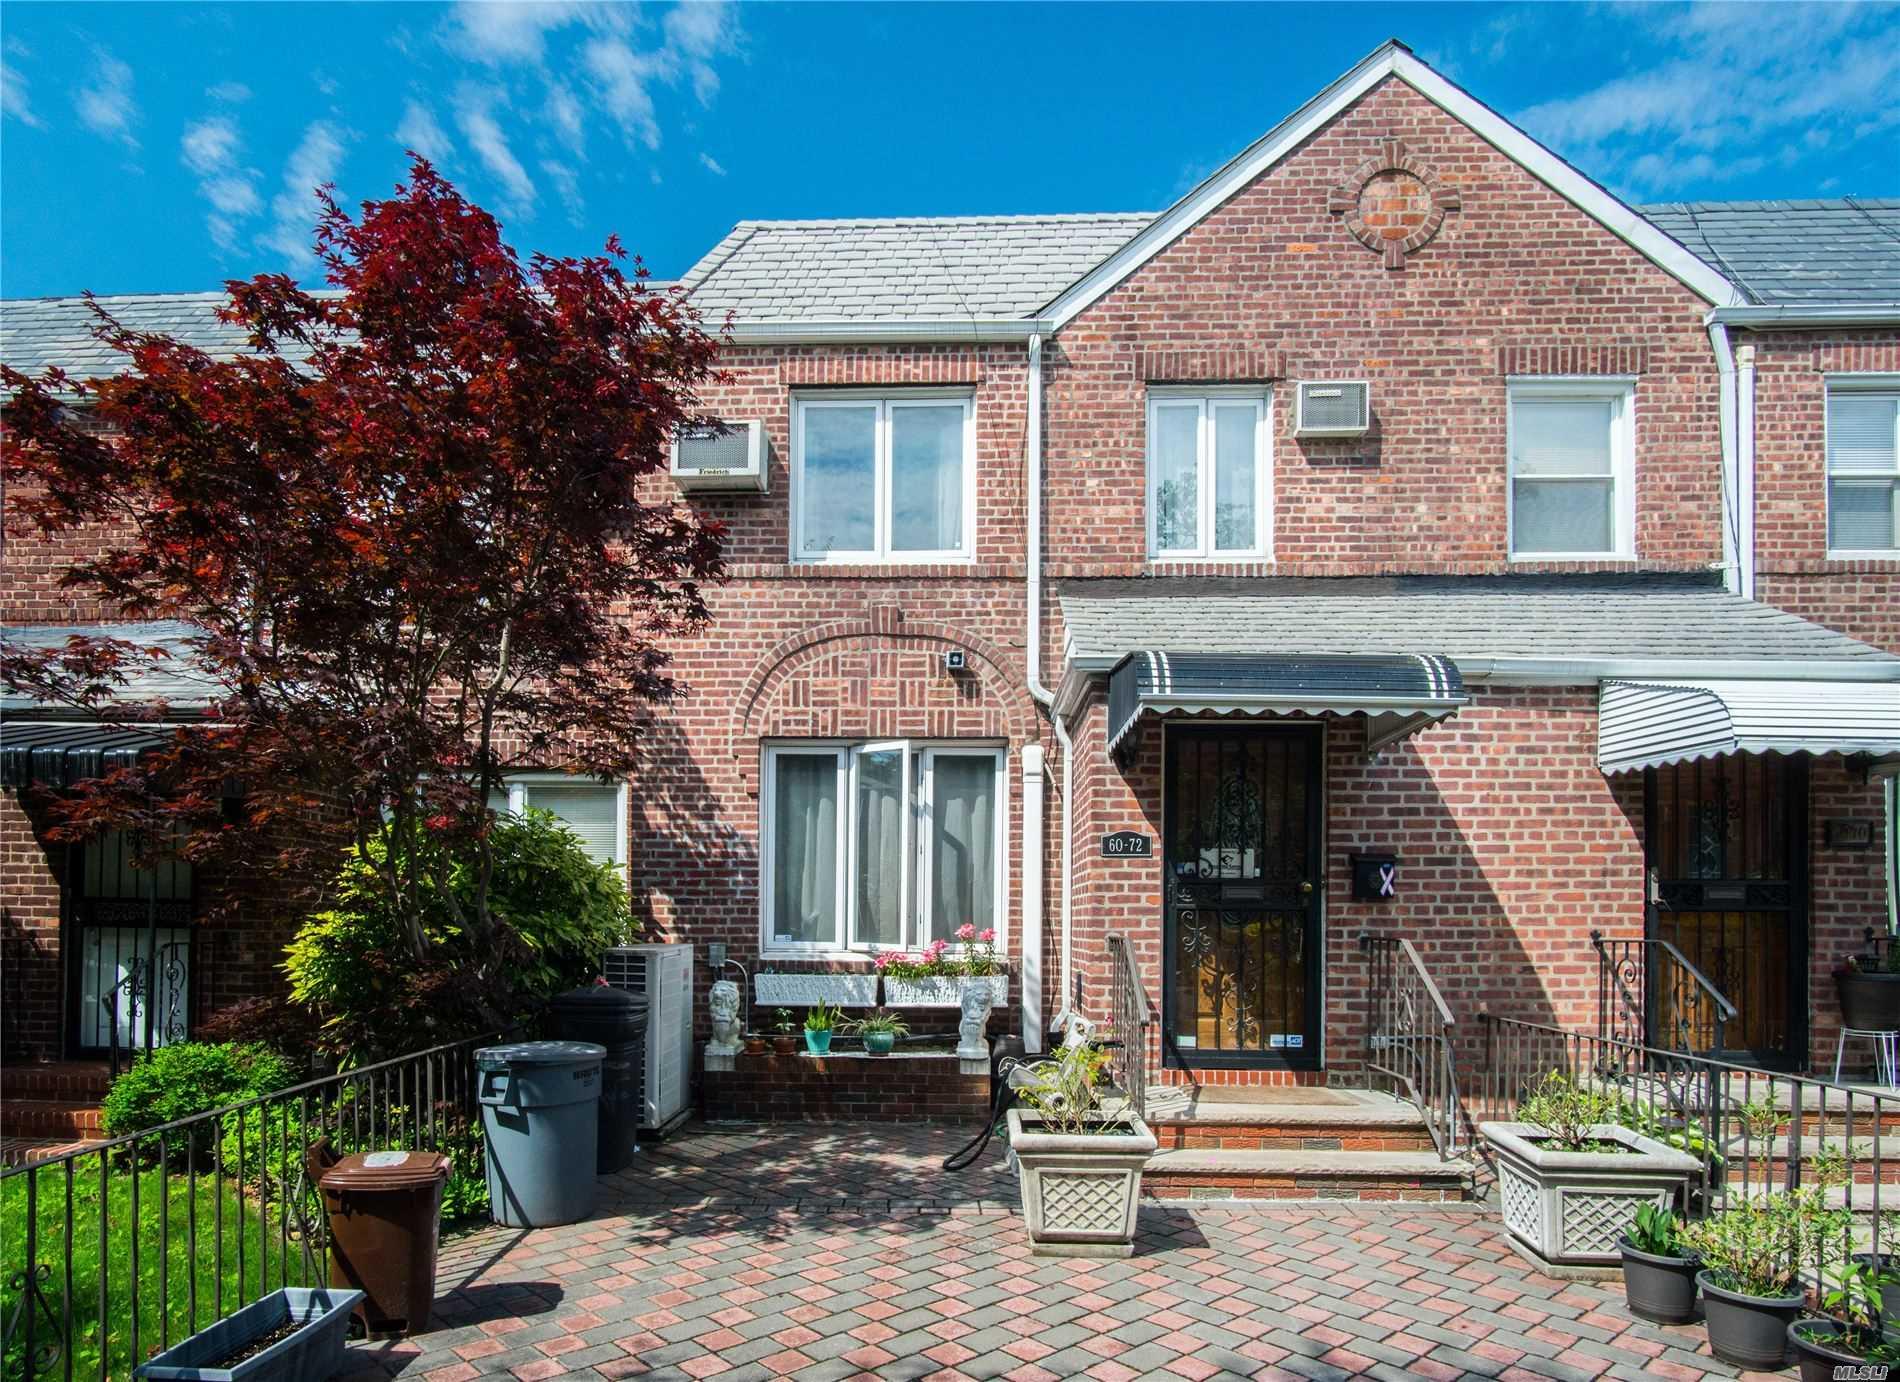 Property for sale at 60-72 71st Street, Maspeth NY 11378, Maspeth,  New York 11378